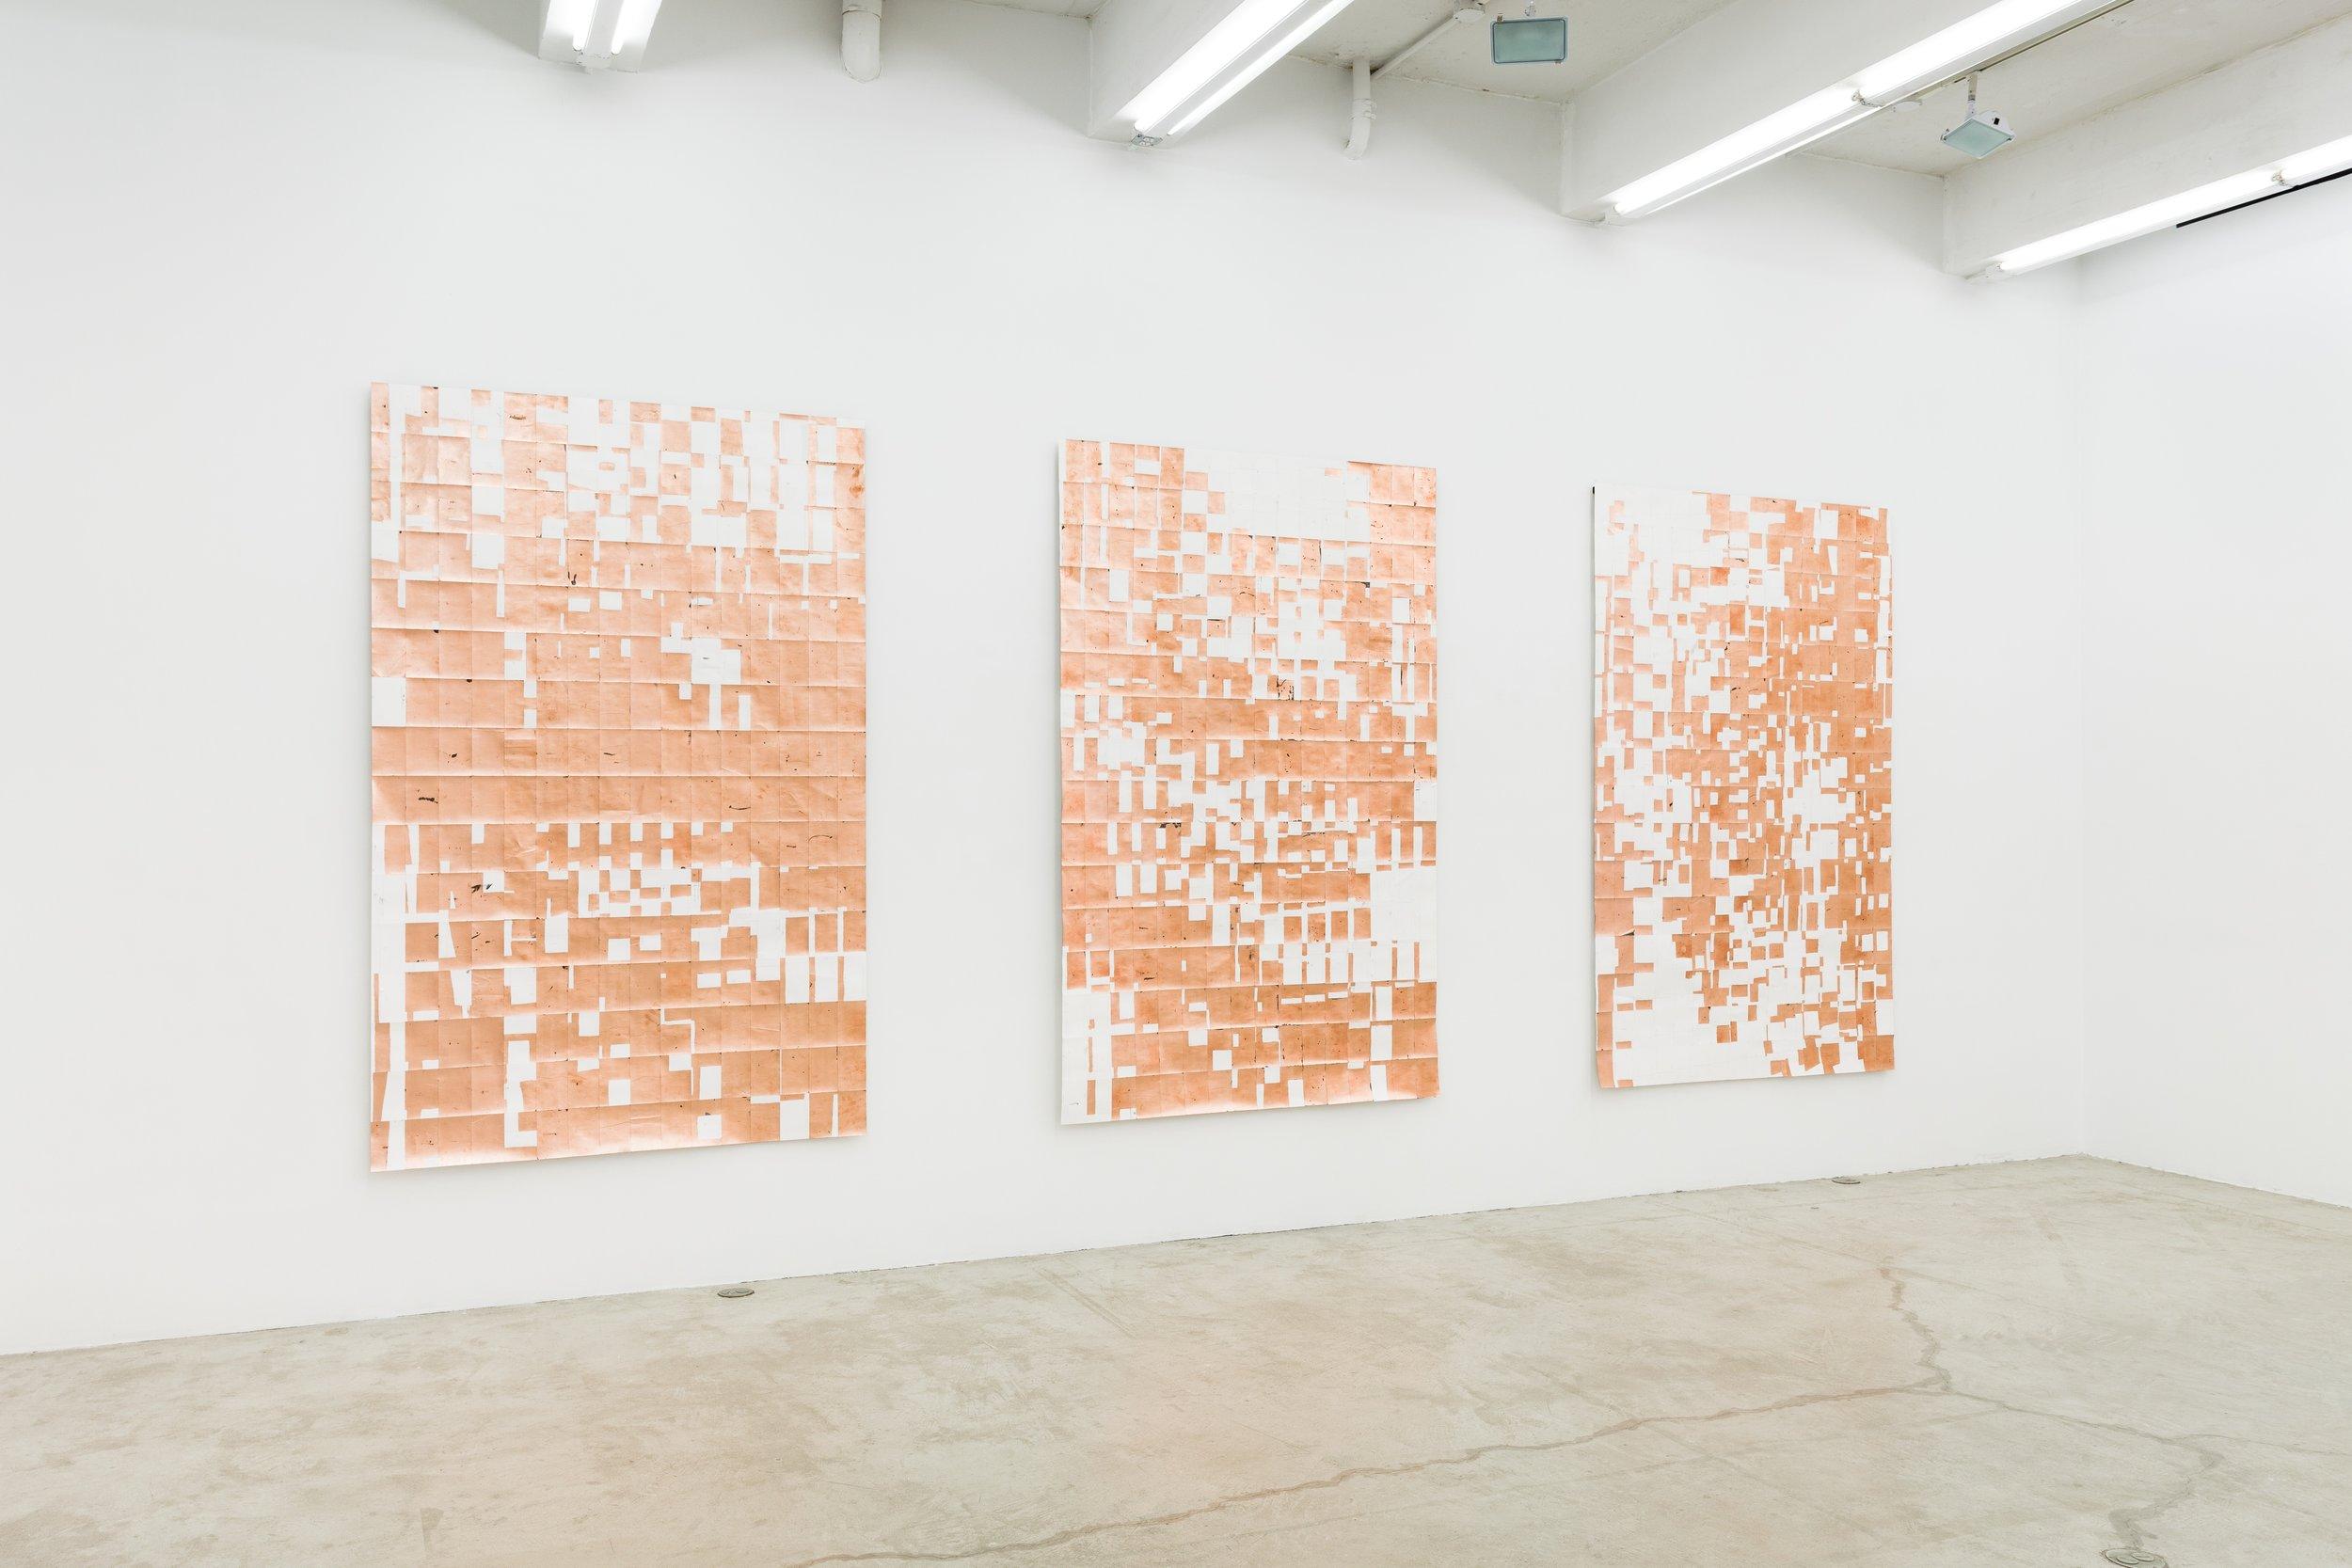 Installation view,  Aux quatre vents, Martos Gallery, New York, 2013